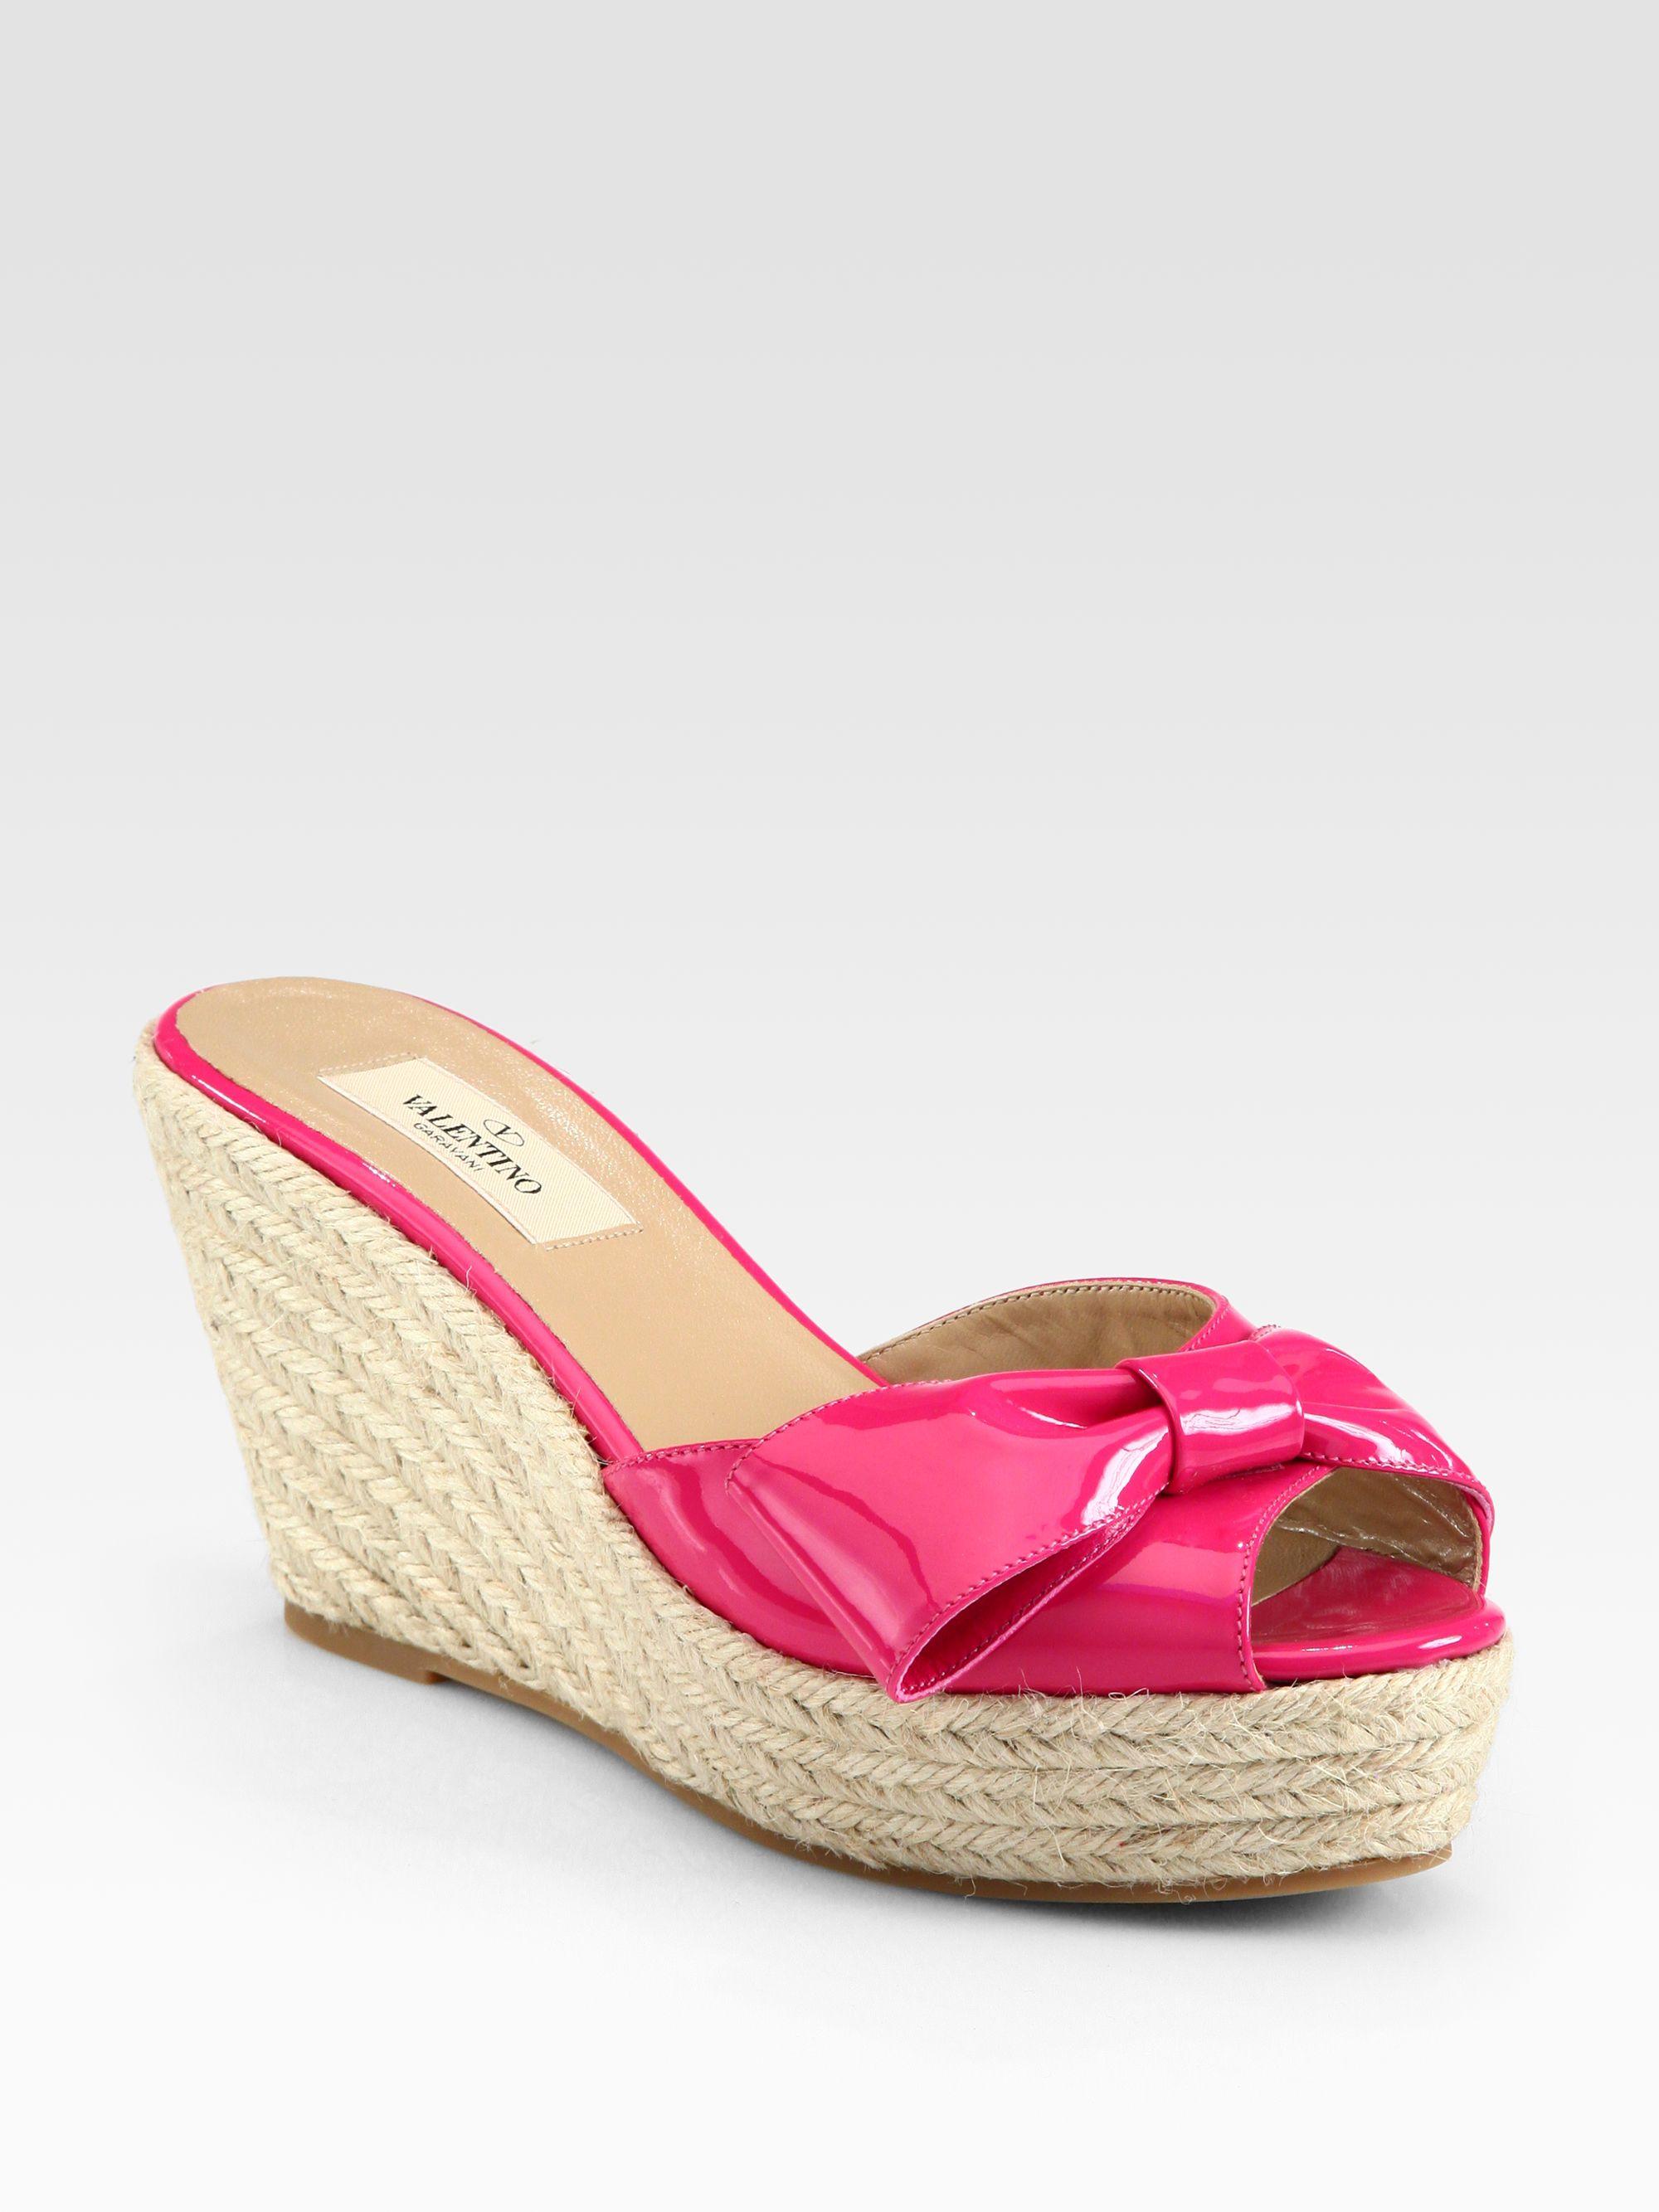 6fa428ffb4e Valentino Pink Mena Patent Leather Bow Espadrille Wedges